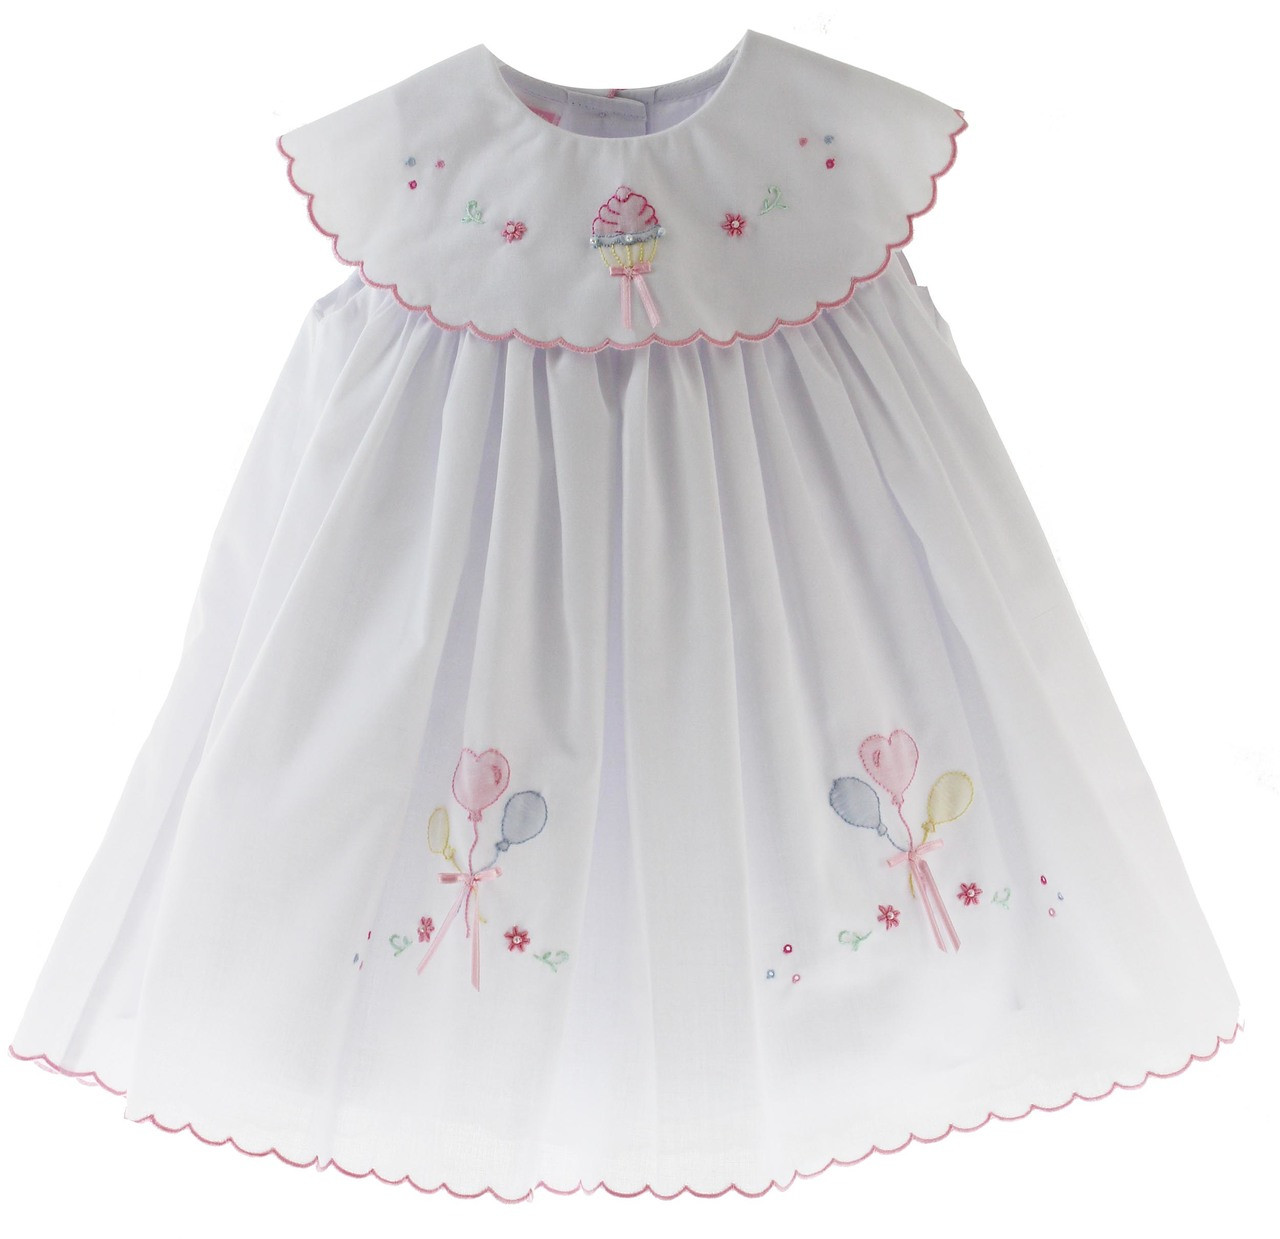 cc52b67e1c Girls White Birthday Dress Embroidered Cake Round Collar. Click to enlarge